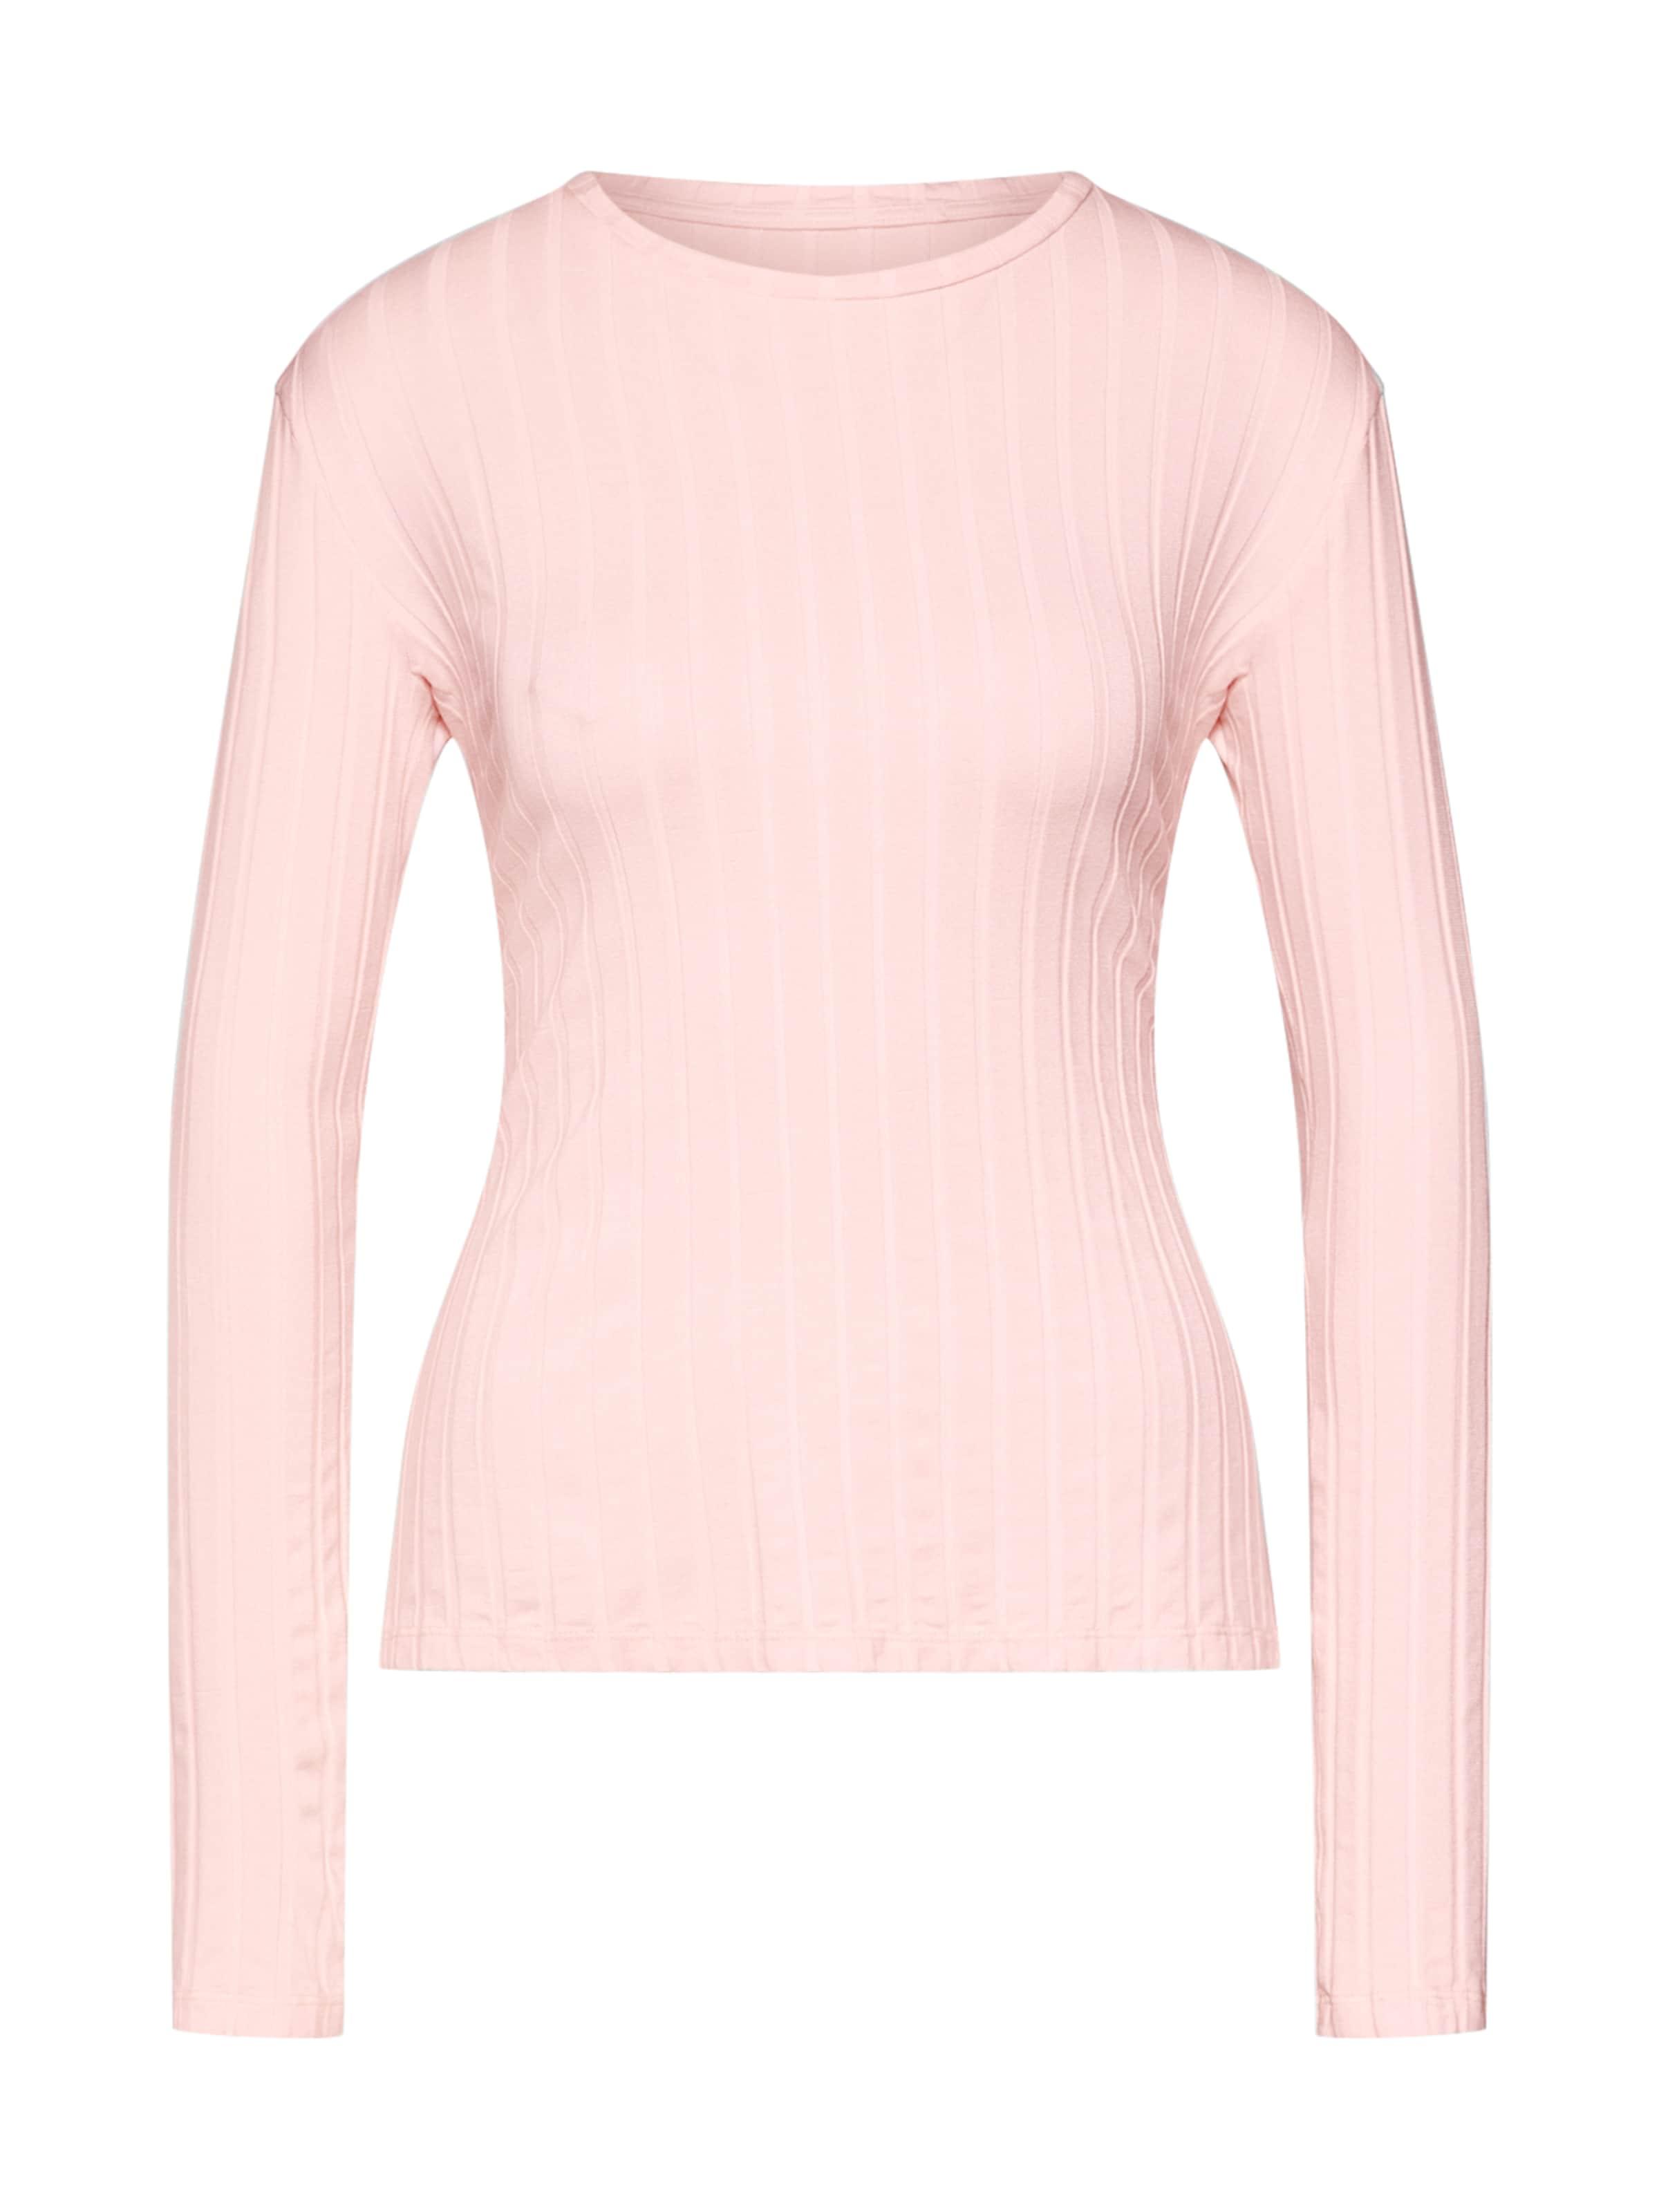 Violet shirt 'kyleigh' Edited T En xsrdtohQCB